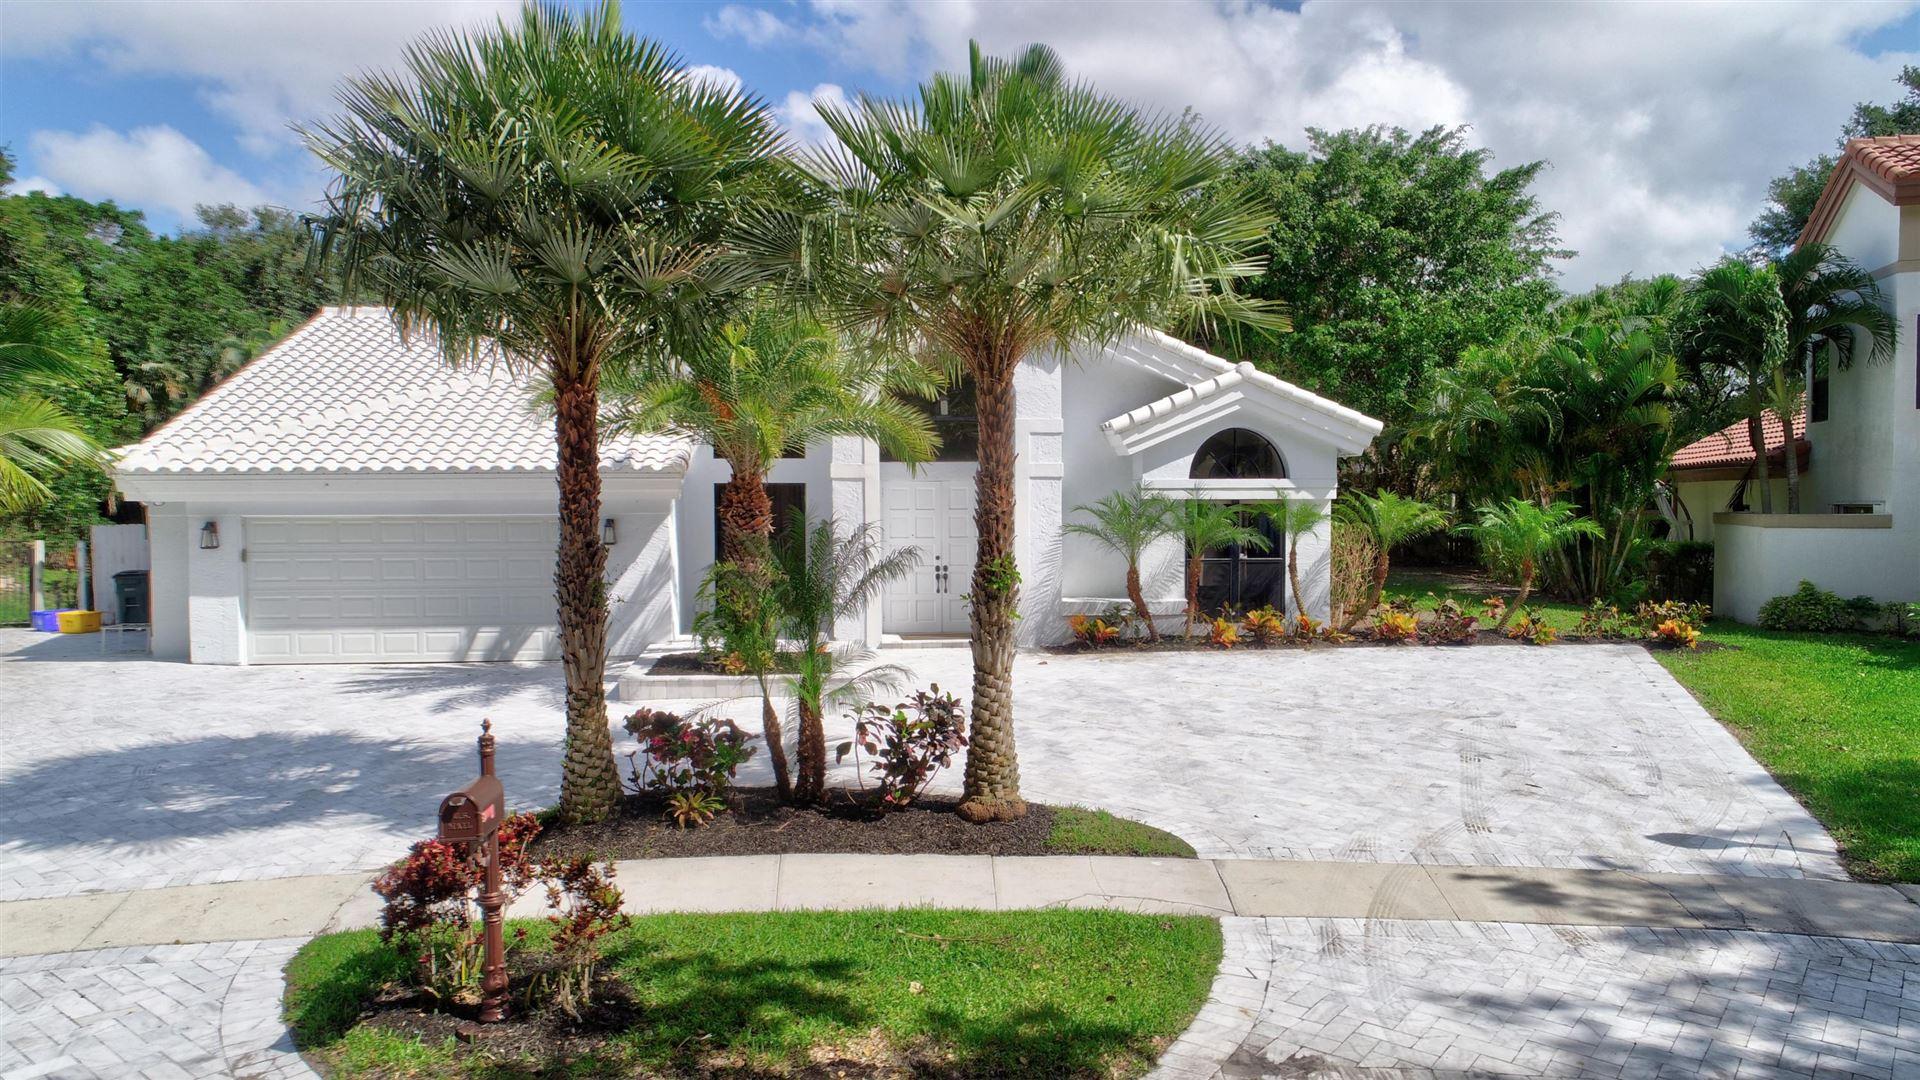 2516 NW 44th Court, Boca Raton, FL 33434 - #: RX-10626759